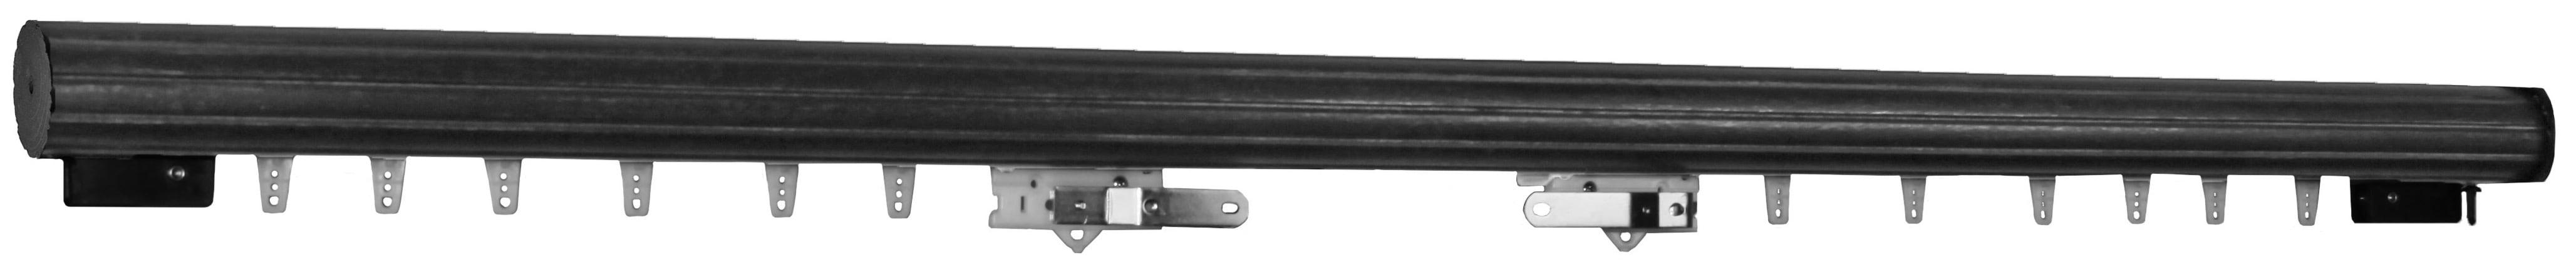 rod length diagram